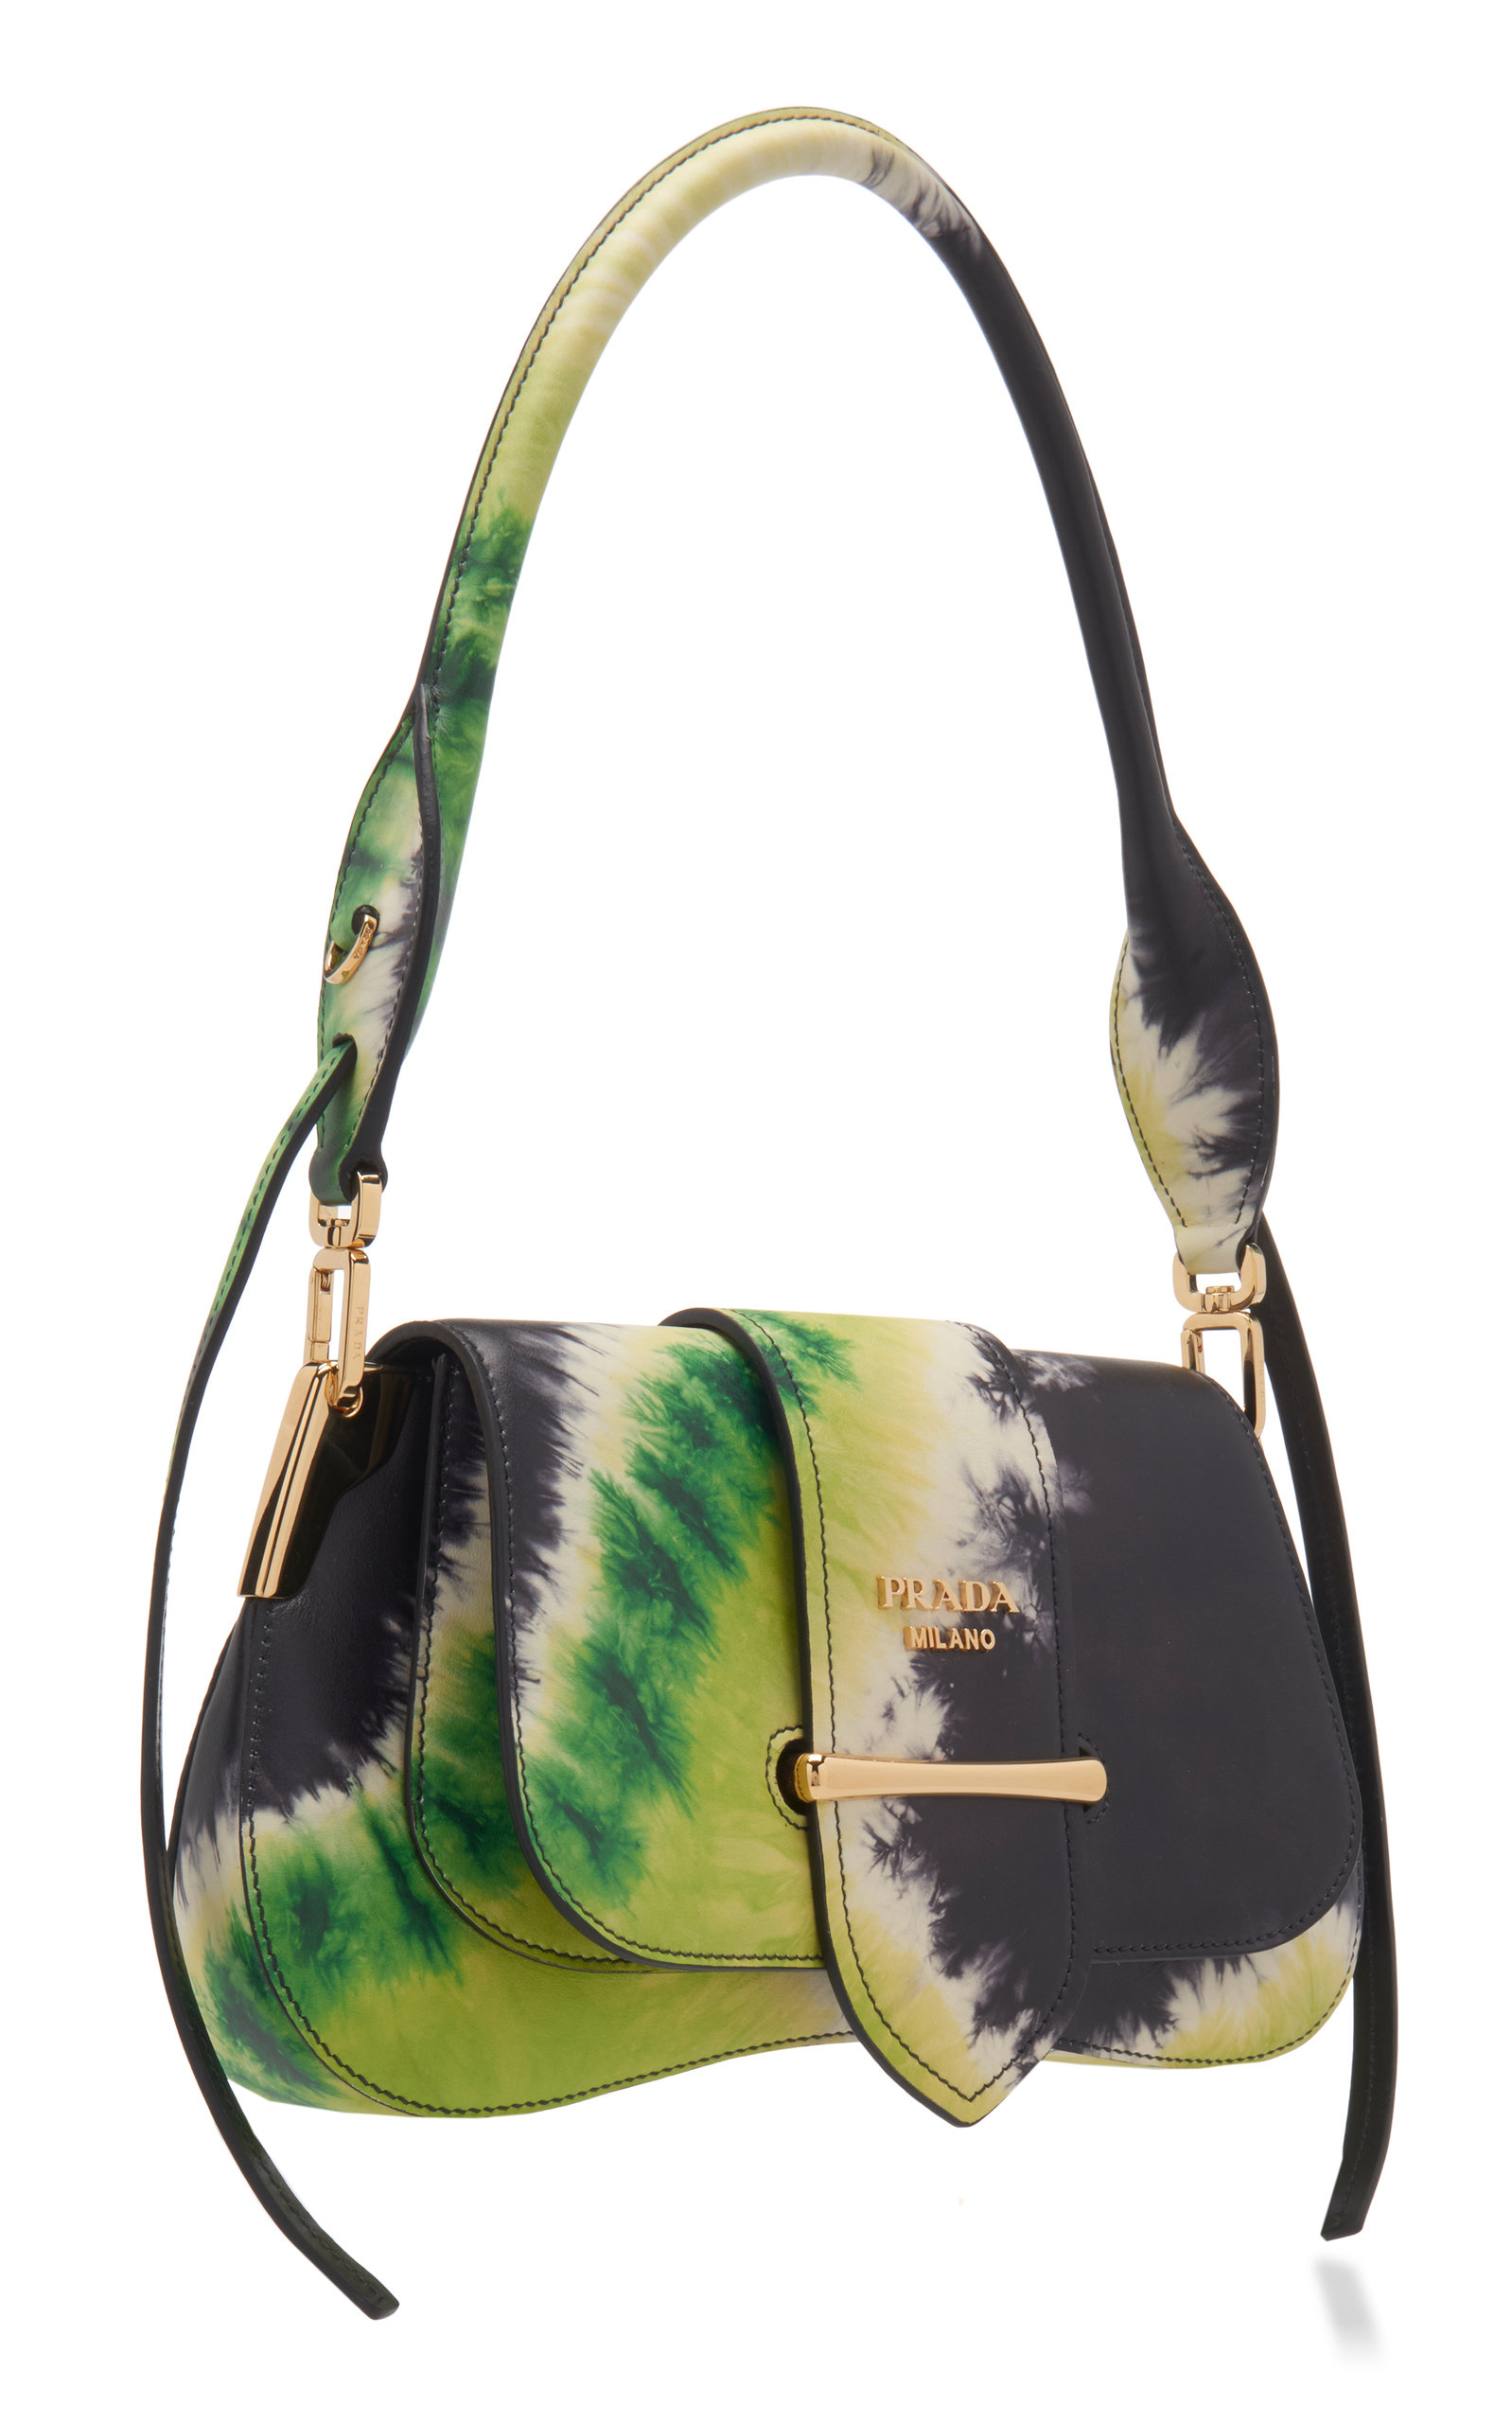 ee143cba4e74 Pattina Tie-Dye Leather Shoulder Bag by Prada